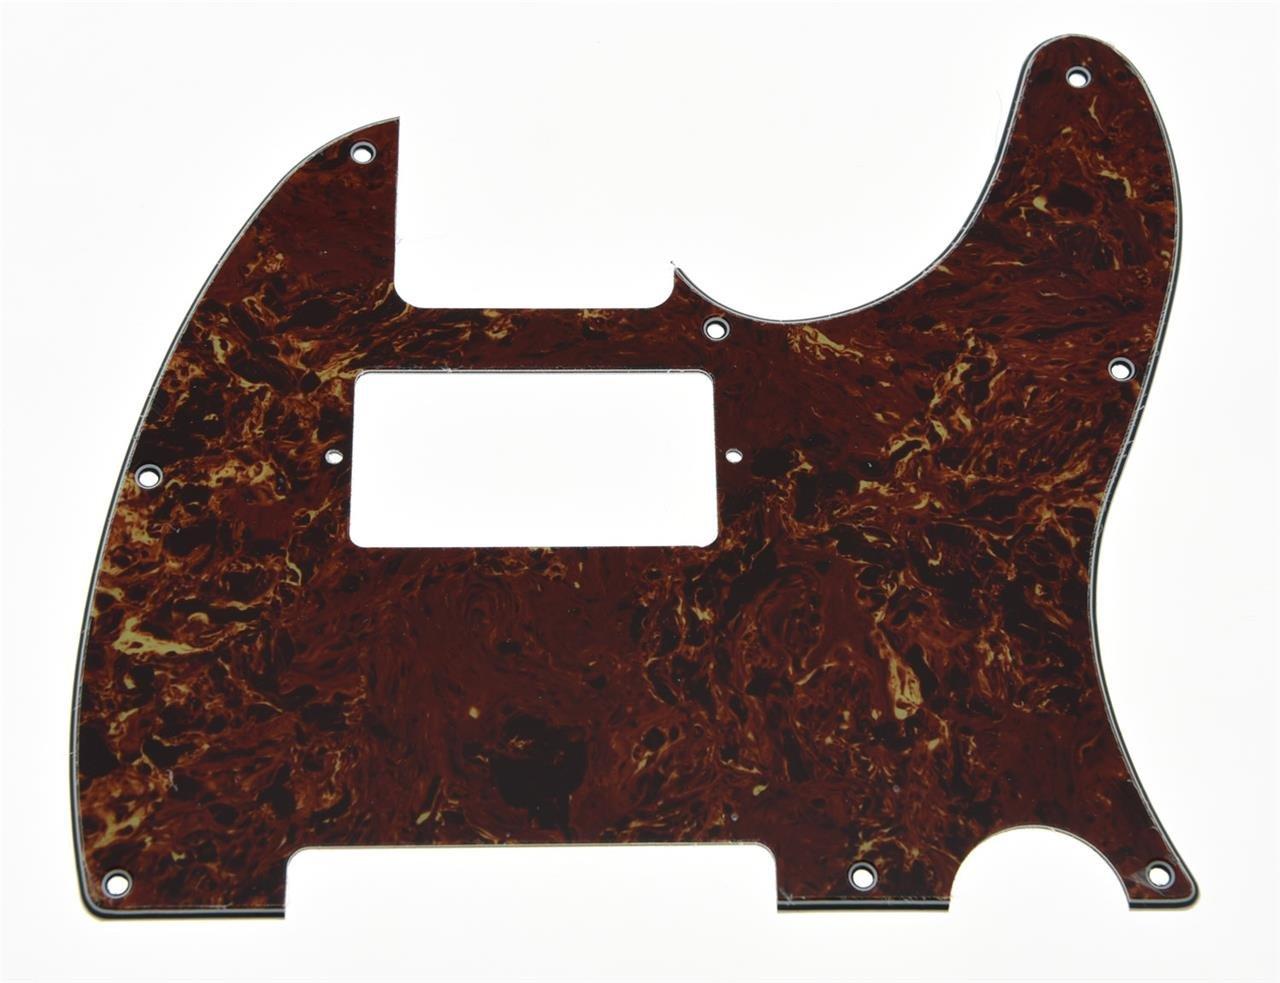 kaish Vintage tortuga tele pastilla Humbucker para guitarra el/éctrica guitarra Golpeador ara/ñazos Placa para Fender Telecaster